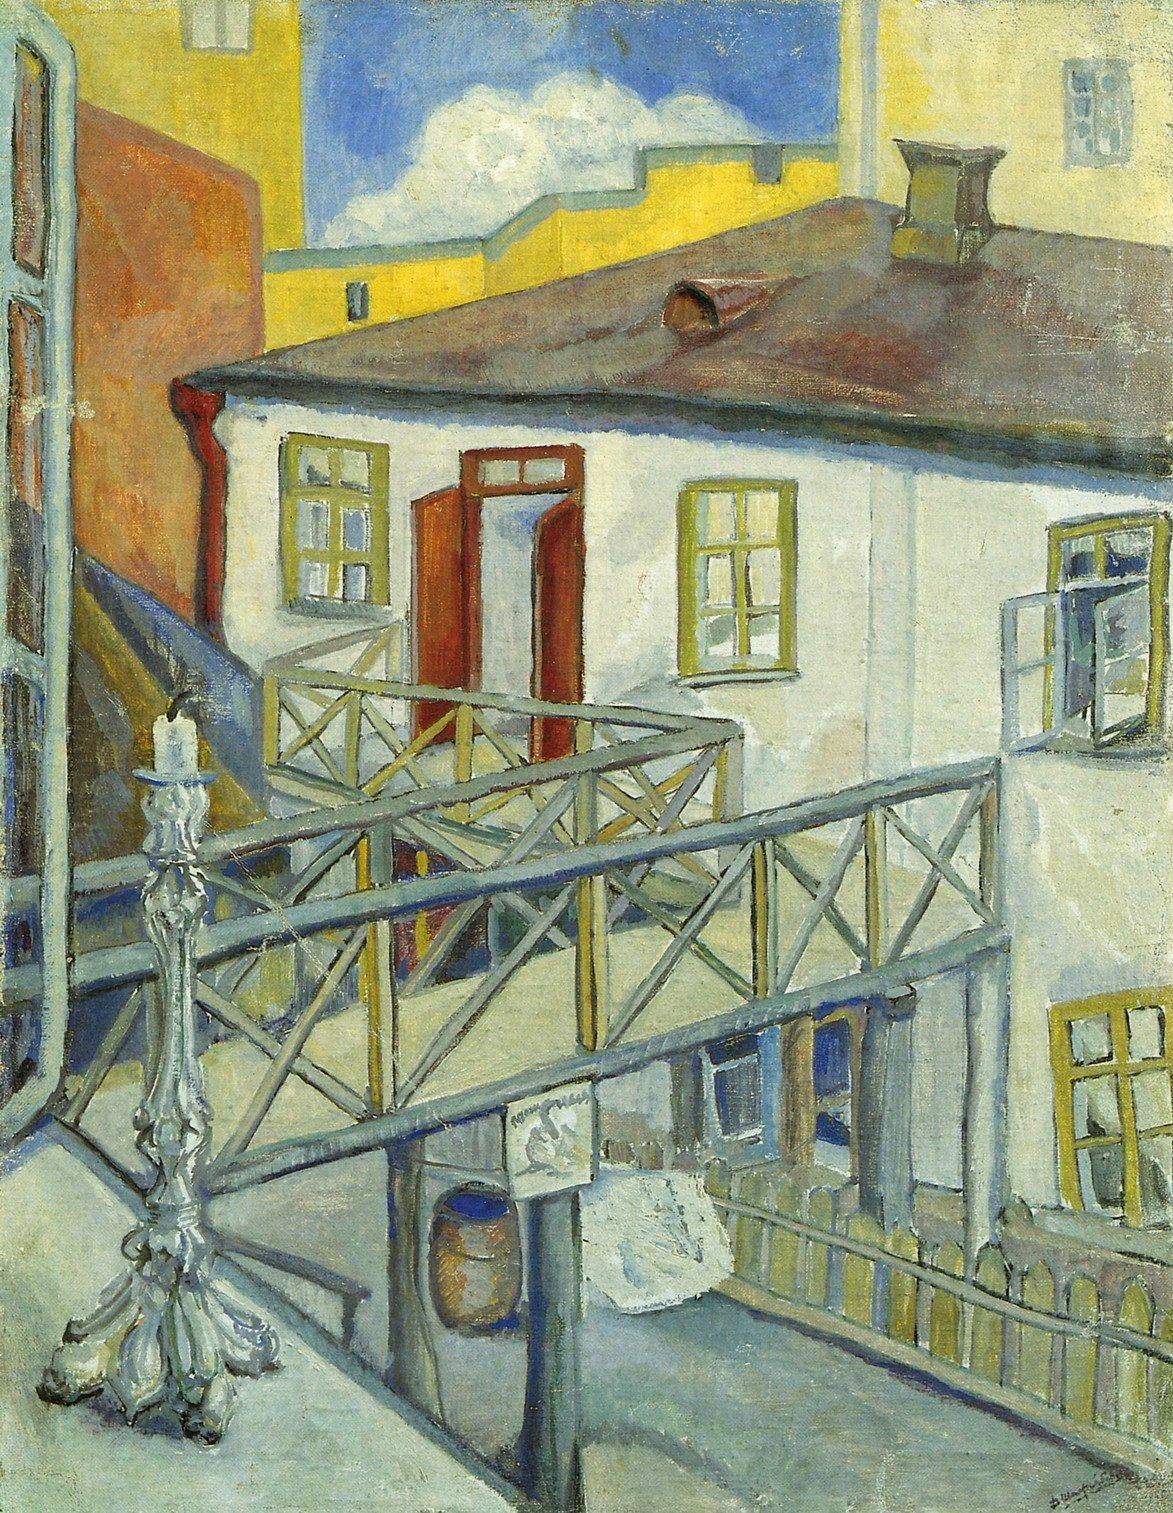 Shterenberg, David, (1881-1948), Courtyard of the Hotel, 1914